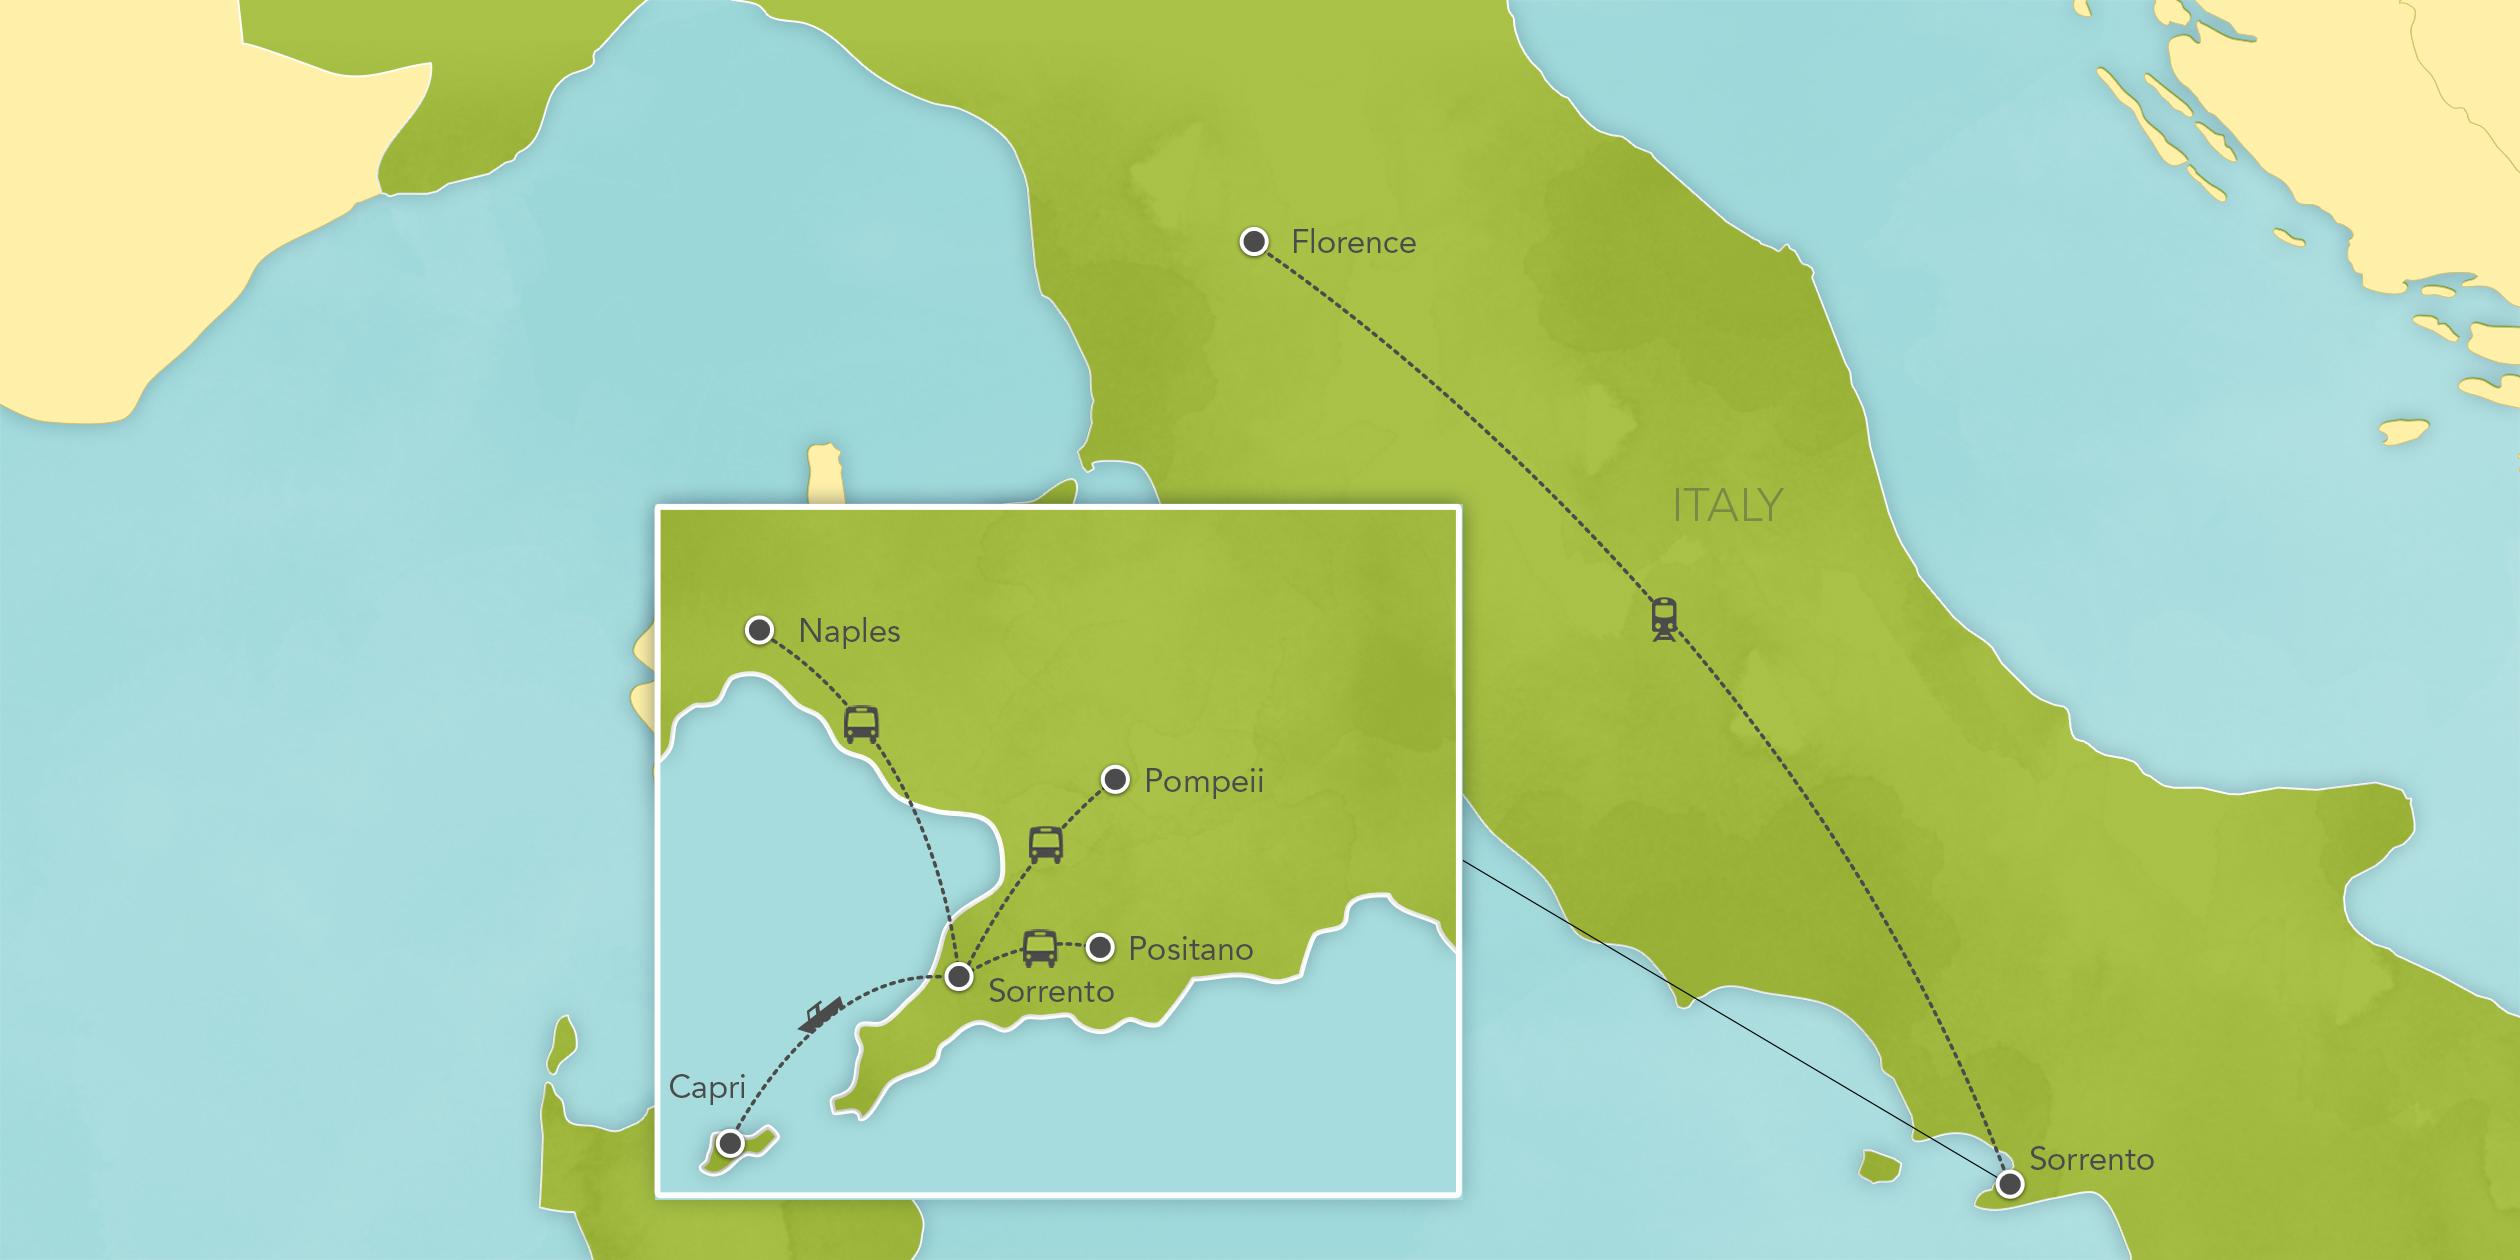 Itinerary map of Italy & Amalfi Coast: Sorrento, Positano, Amalfi, Capri, Naples, Florence, Tuscany, Lucca, Pisa, Siena 2019